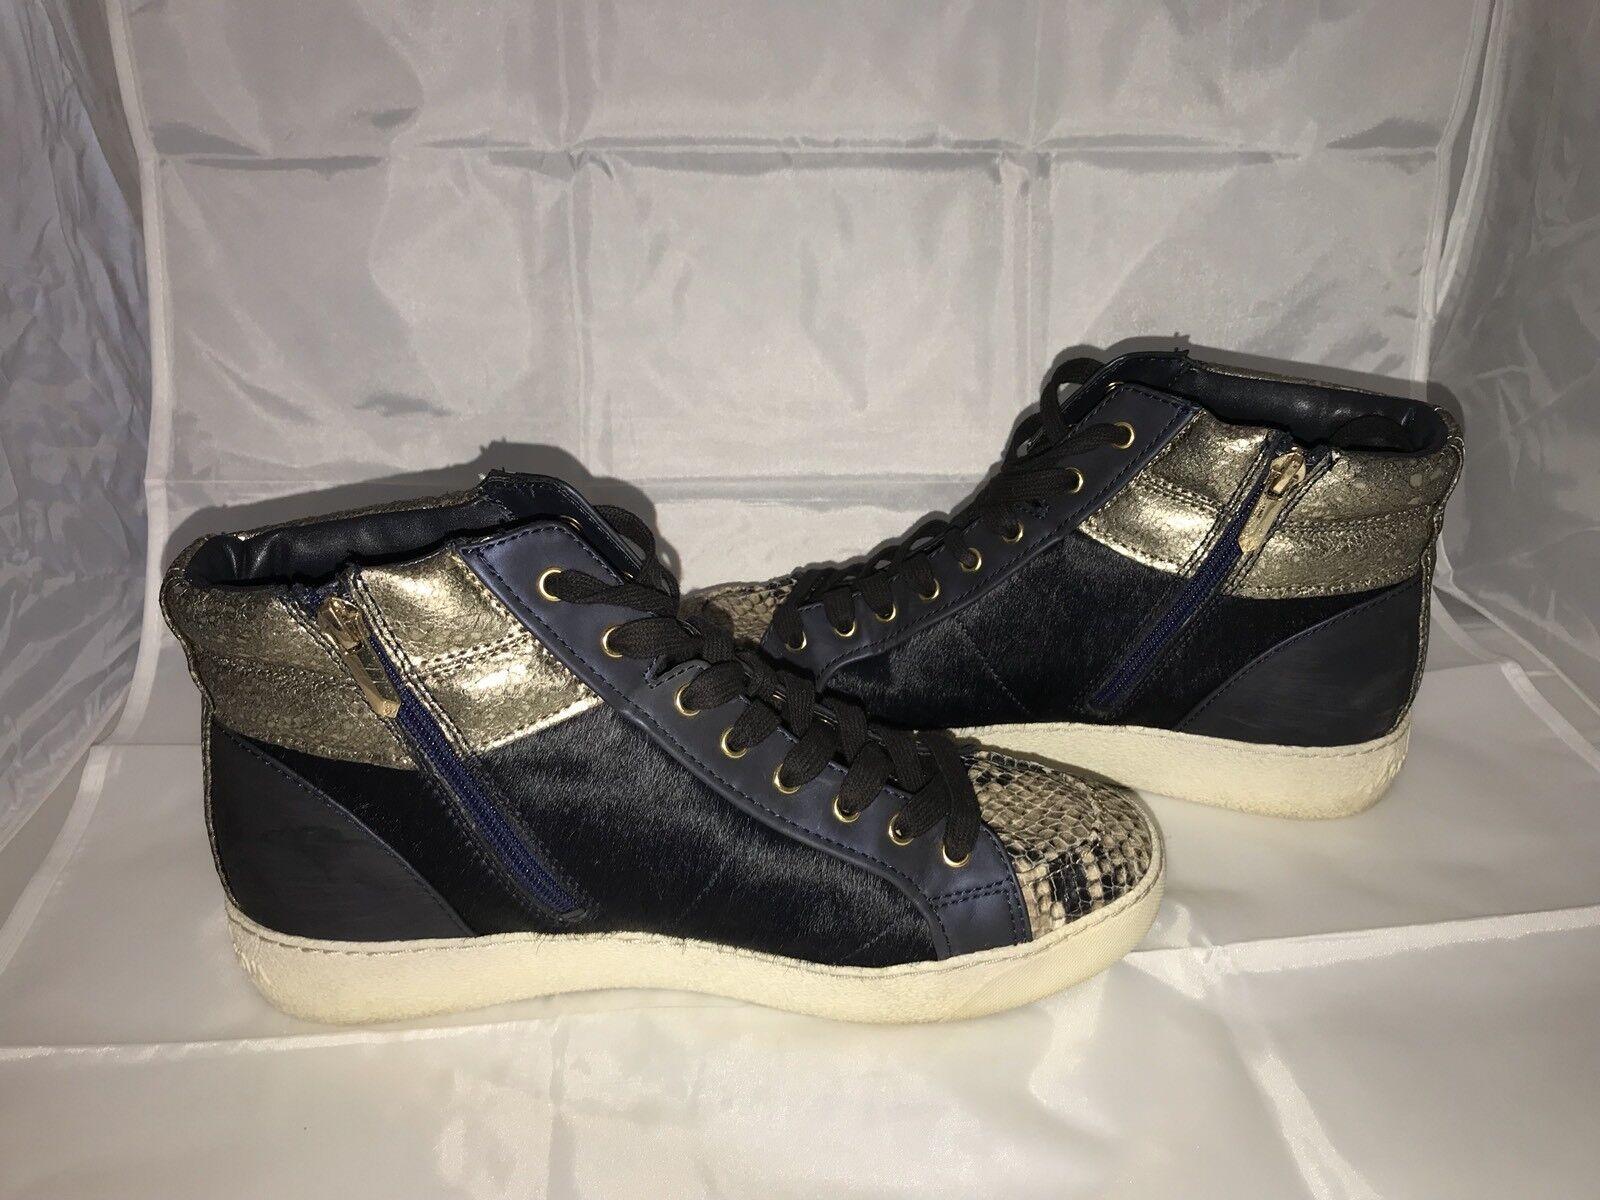 Sam Edelman Britt High Top Sneaker Navy bluee Dyed Cow Fur w  Snake Skin 9.5